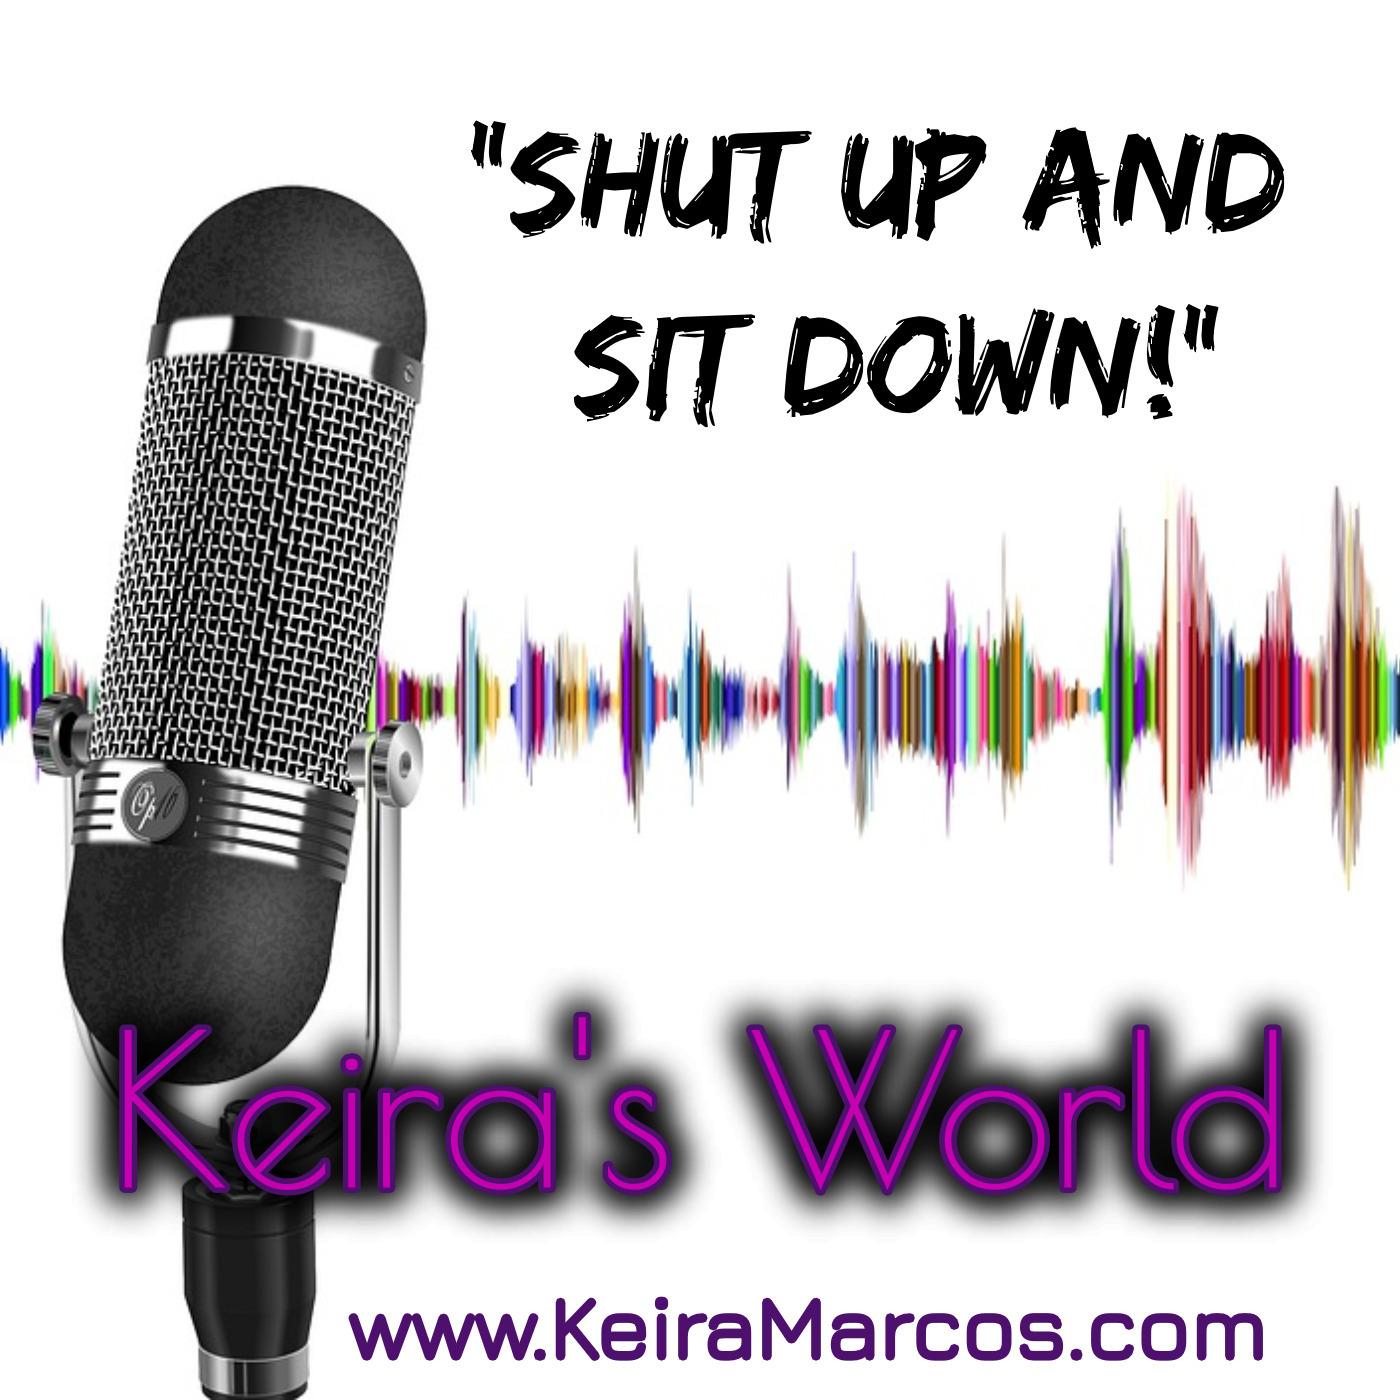 Keira's World